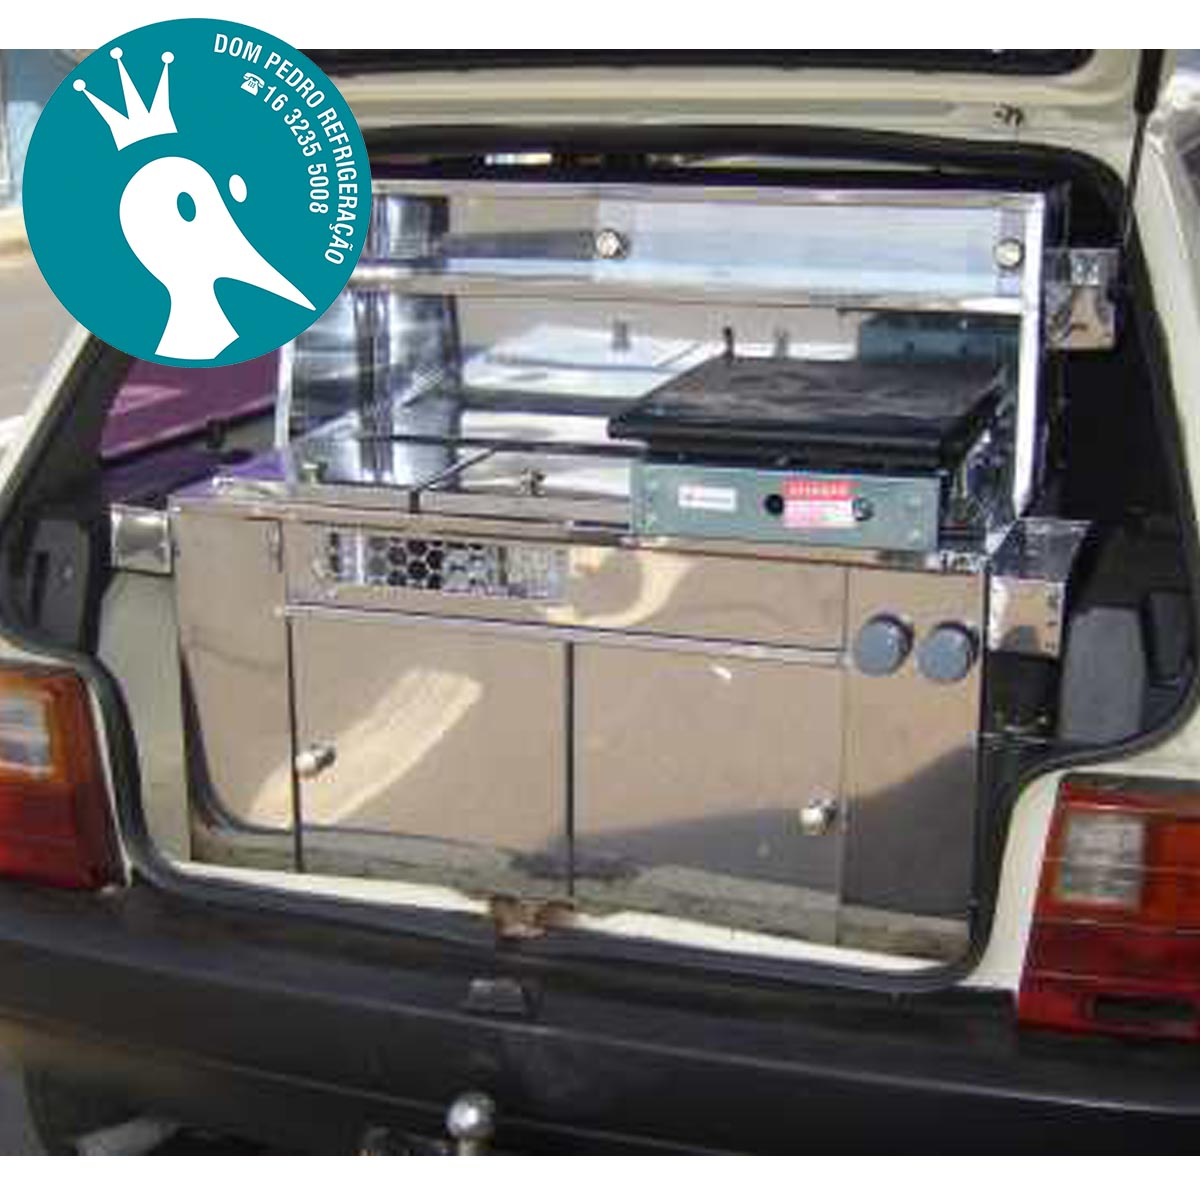 Kit Hot Dog e Lanche Universal - 2 em 1 Para Veículos Hatch